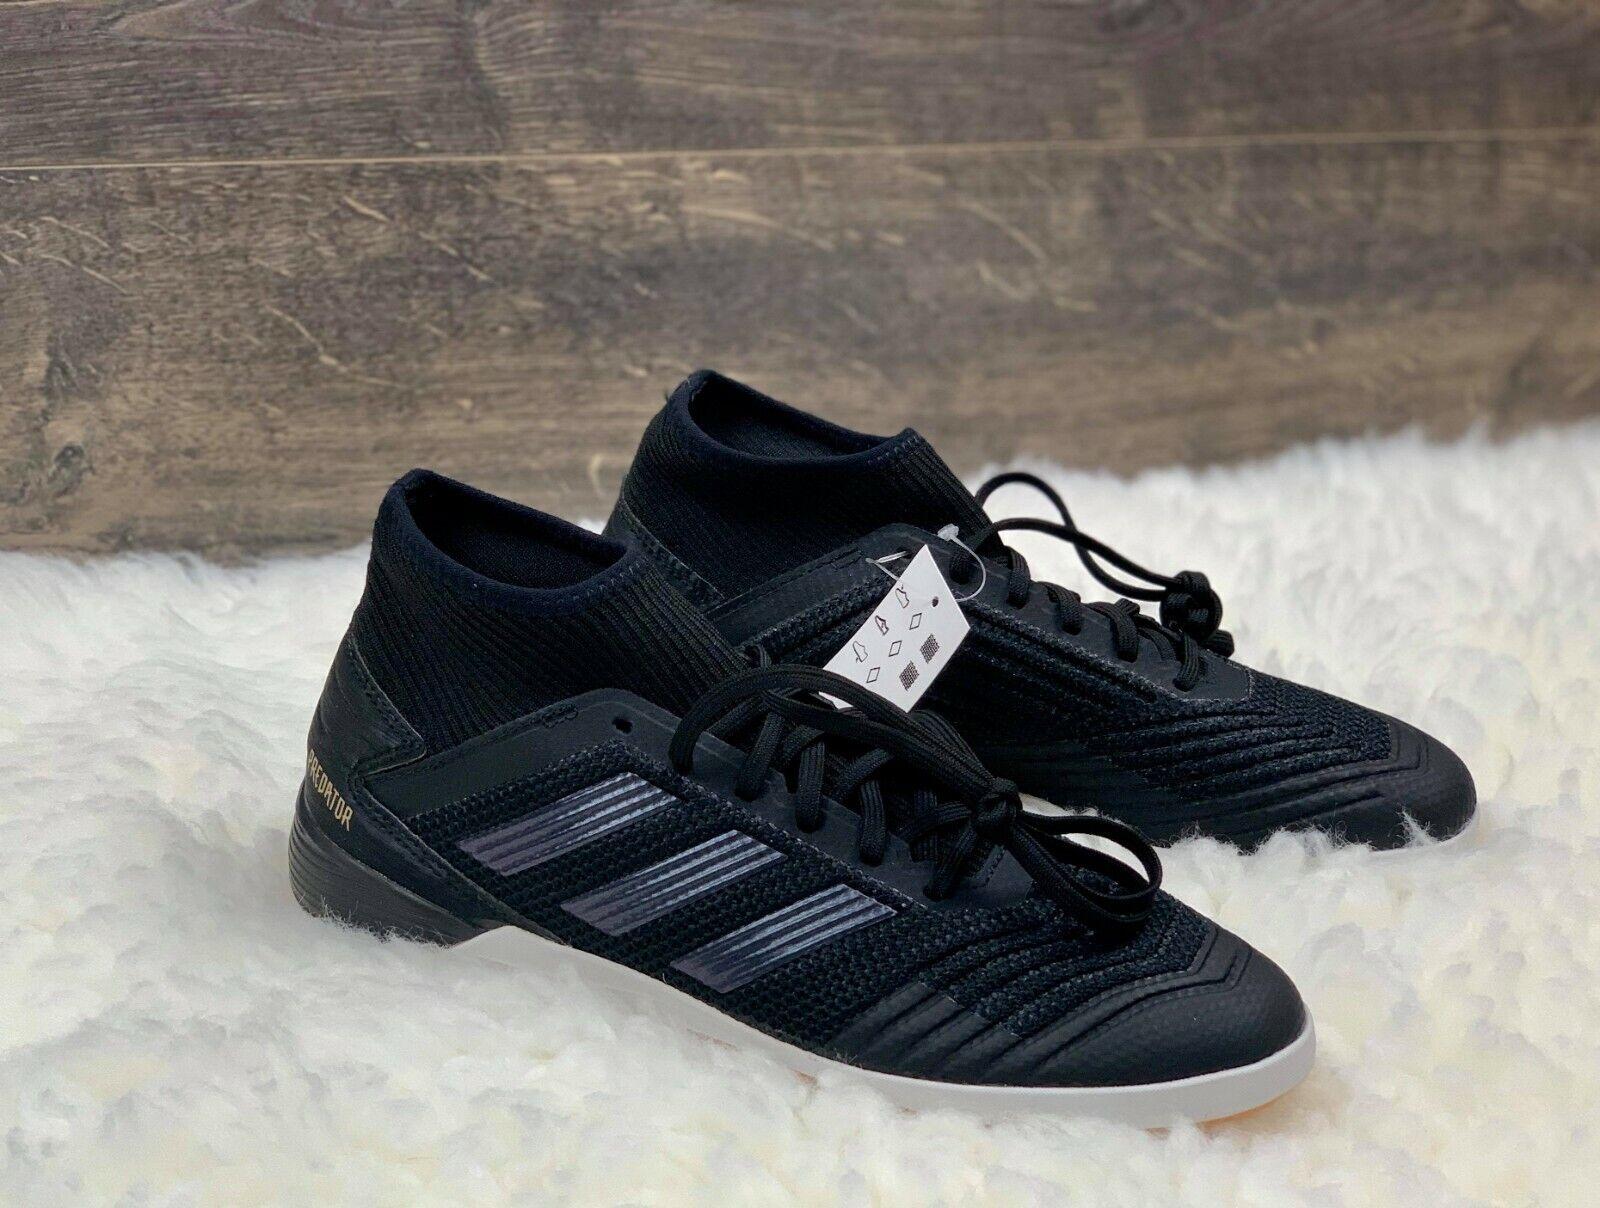 Adidas Predator Tango 19.3 IN Men's Indoor Soccer Shoes Blac